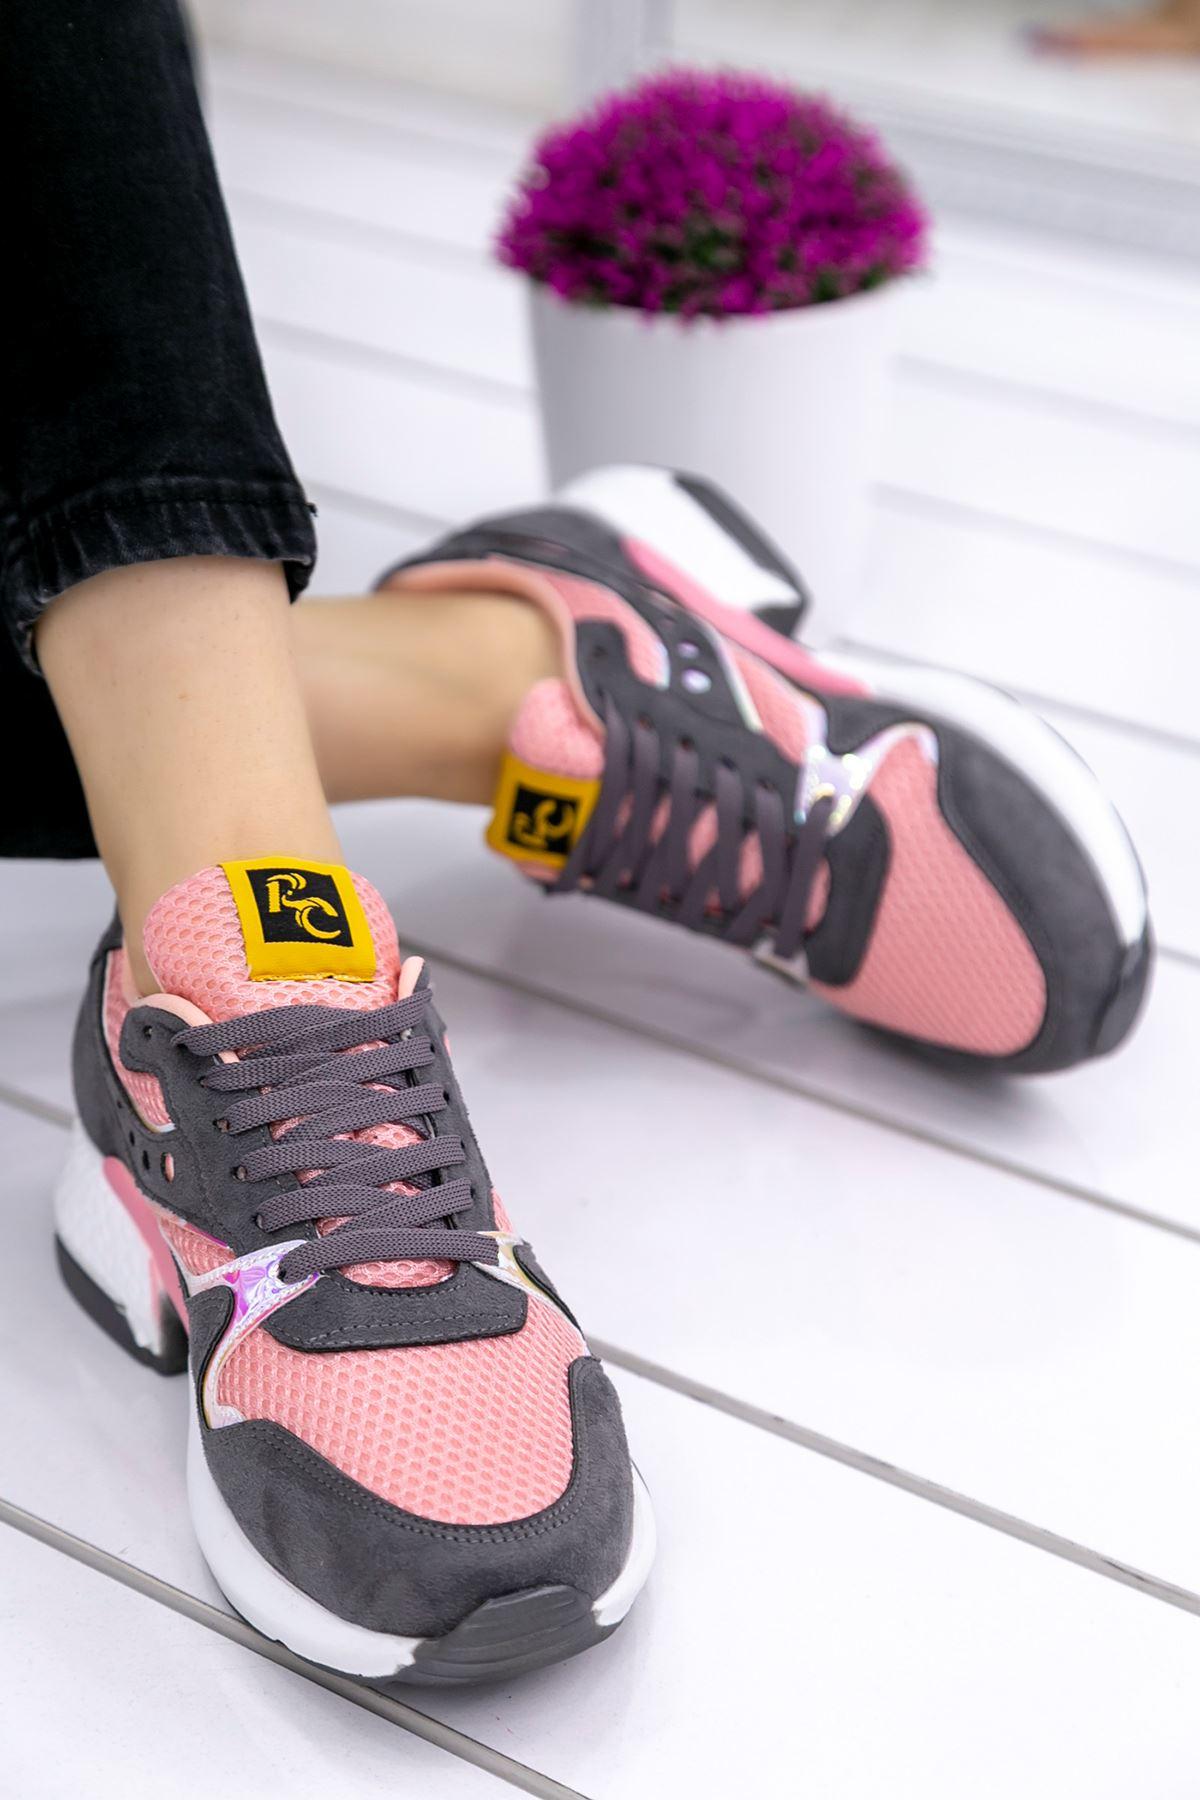 Marzo Gri Pembe Lame İthal Süet Bayan Spor Ayakkabı